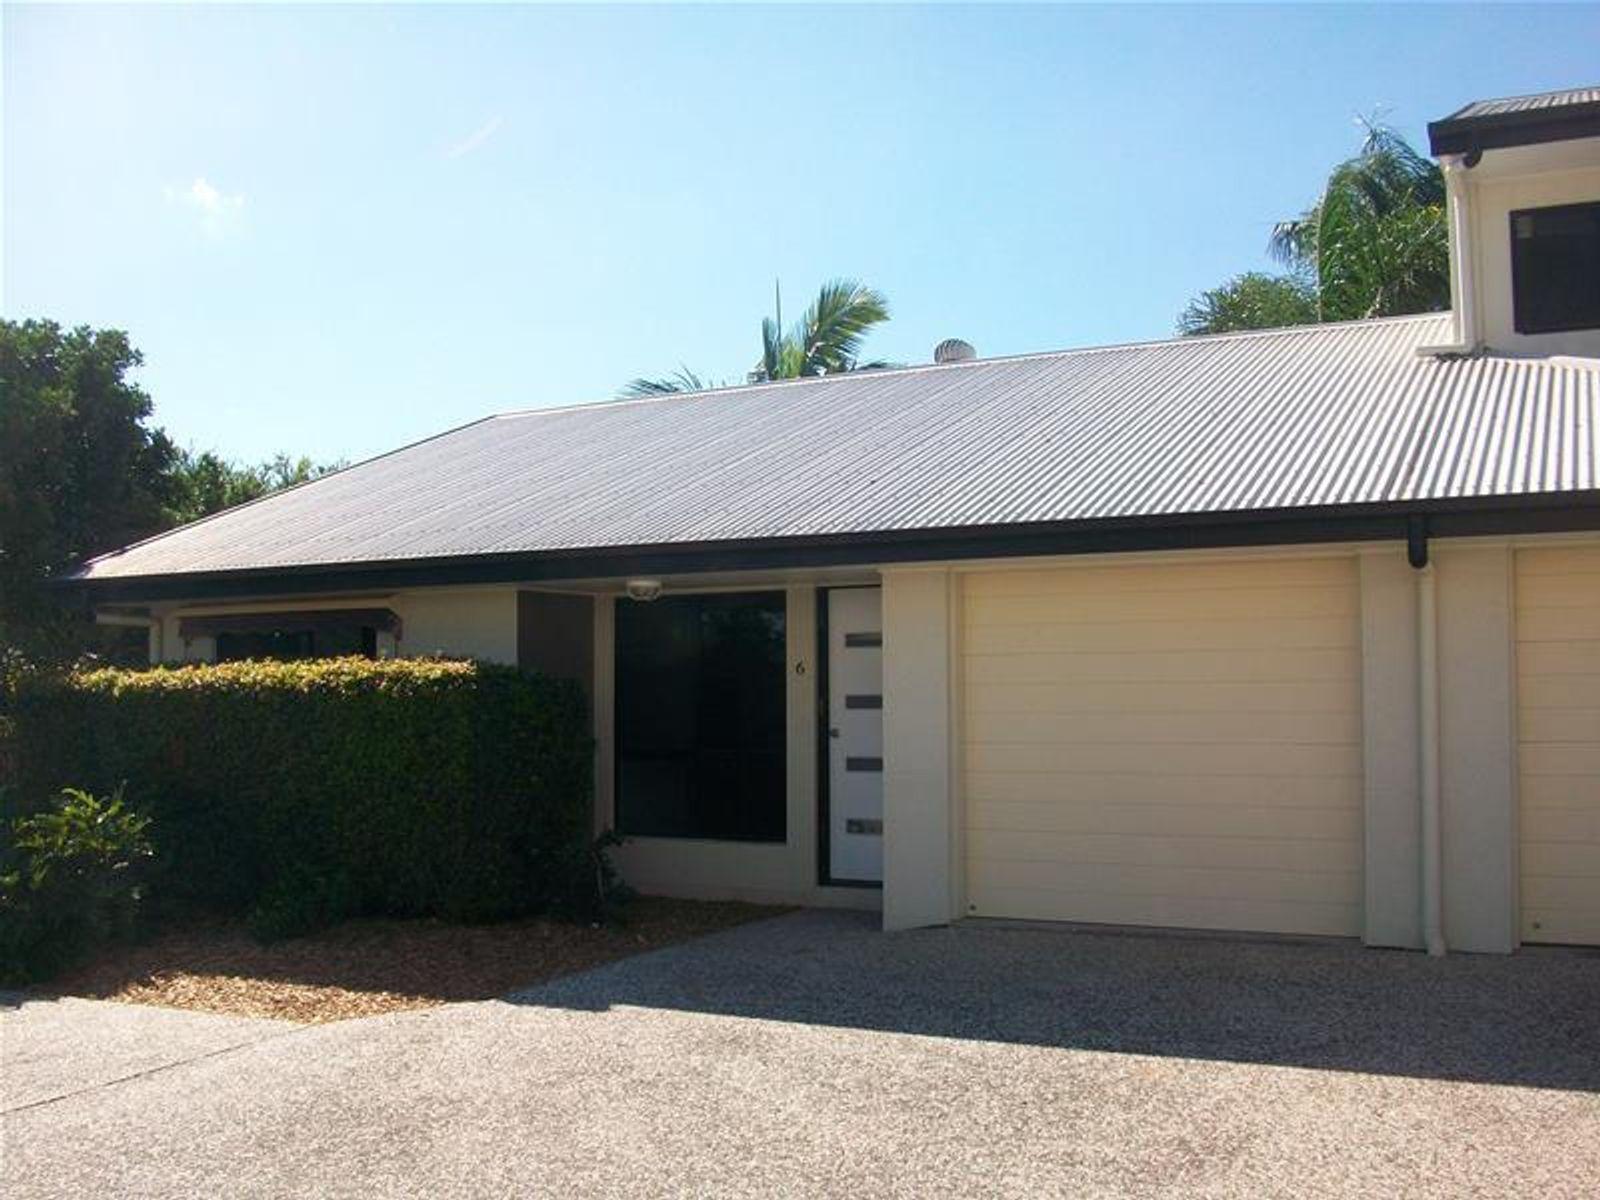 6/58,60 Steuart Street, Bundaberg North, QLD 4670